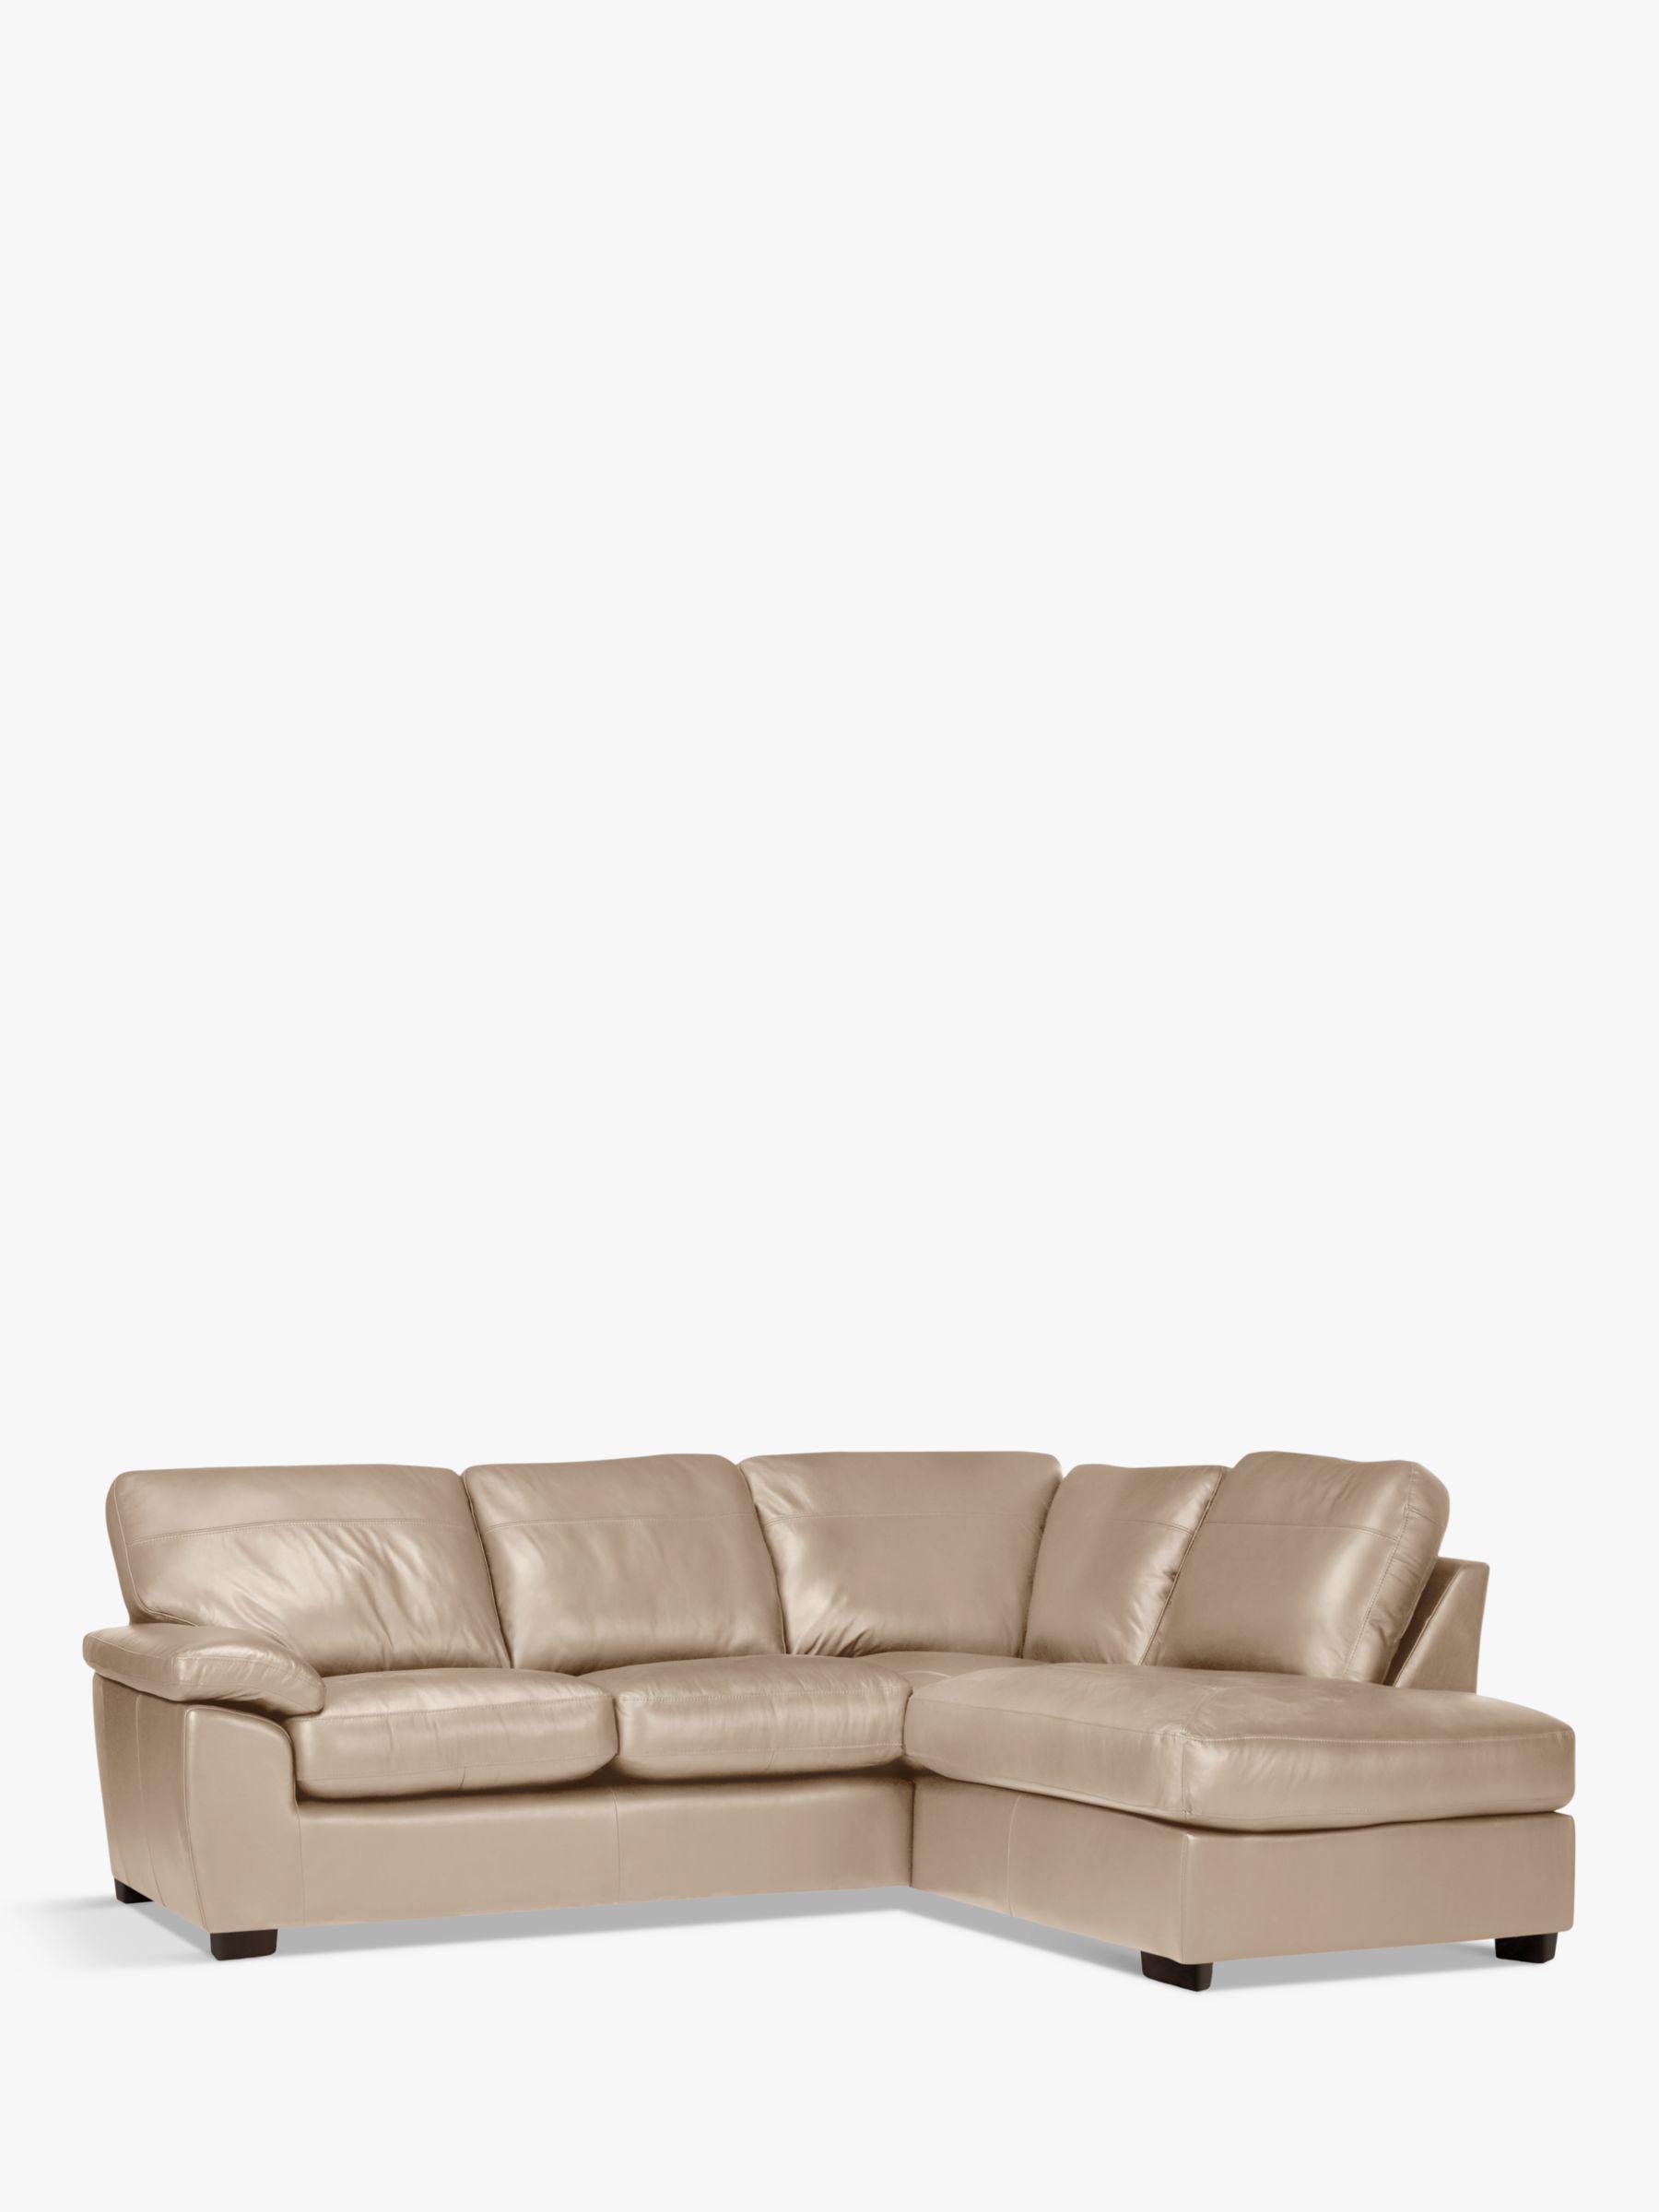 John Lewis Partners Camden Leather Rhf Chaise Corner End Sofa Dark Leg Leather Sofa Sofa John Lewis